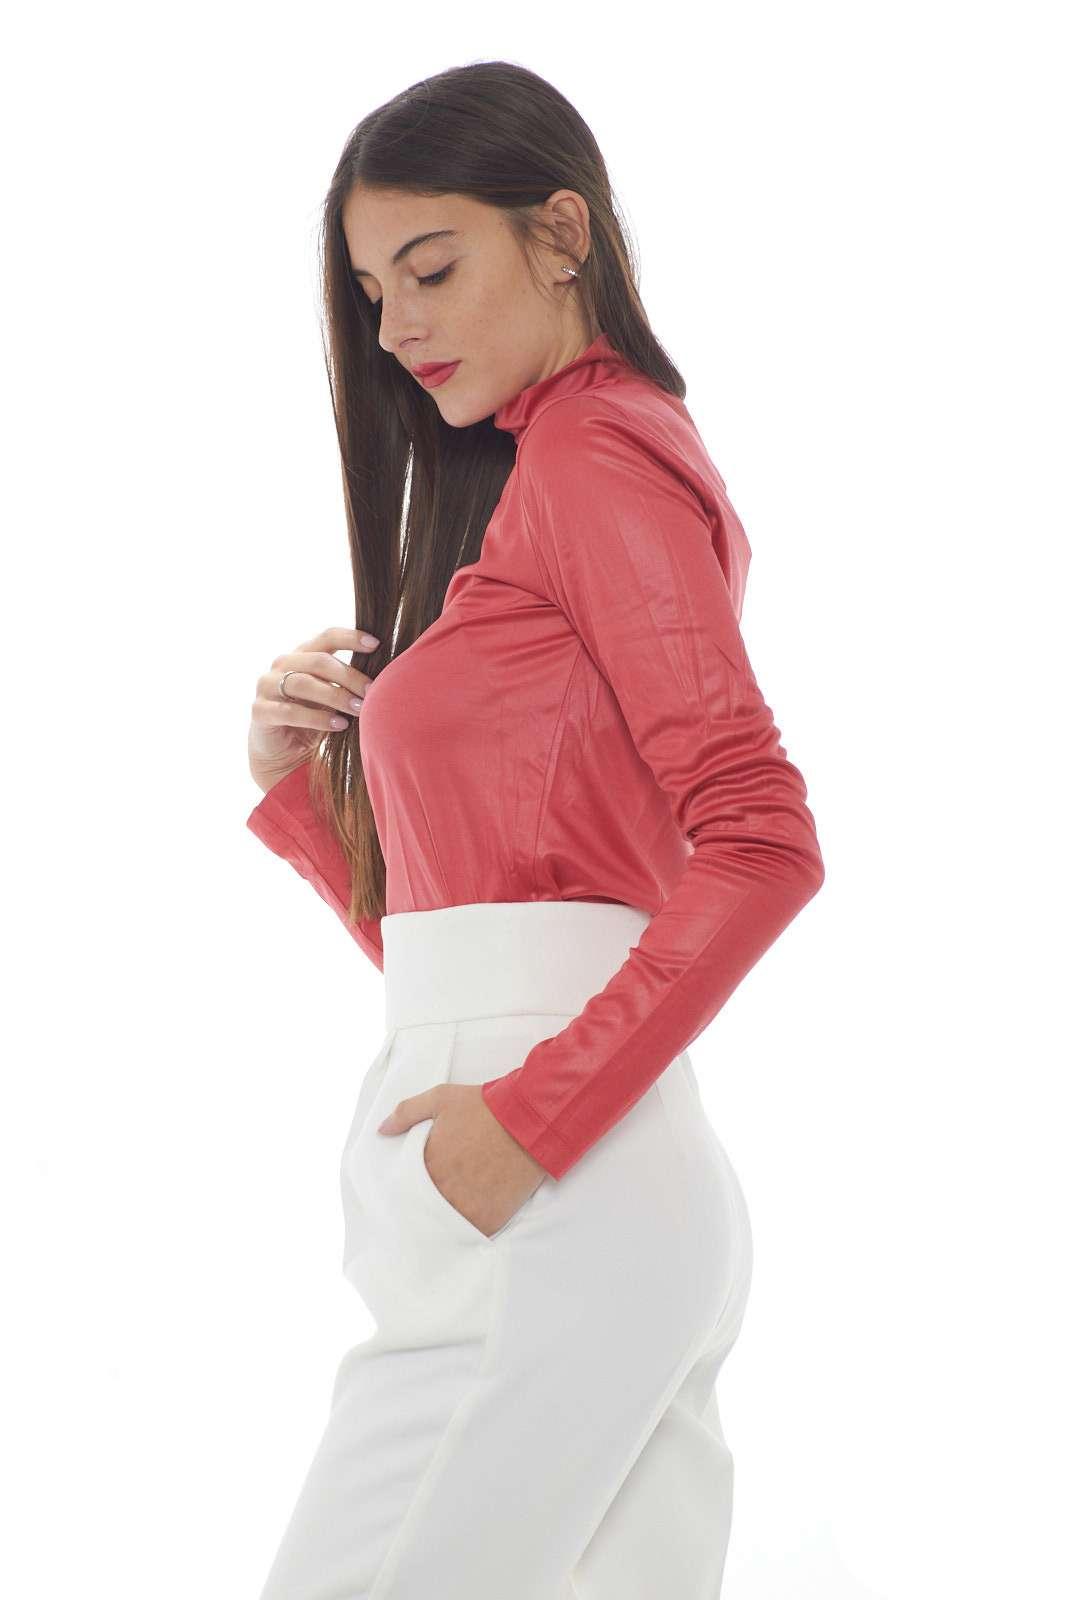 https://www.parmax.com/media/catalog/product/a/i/AI-outlet_parmax-maglia-donna-Pinko-1G14BF-B.jpg